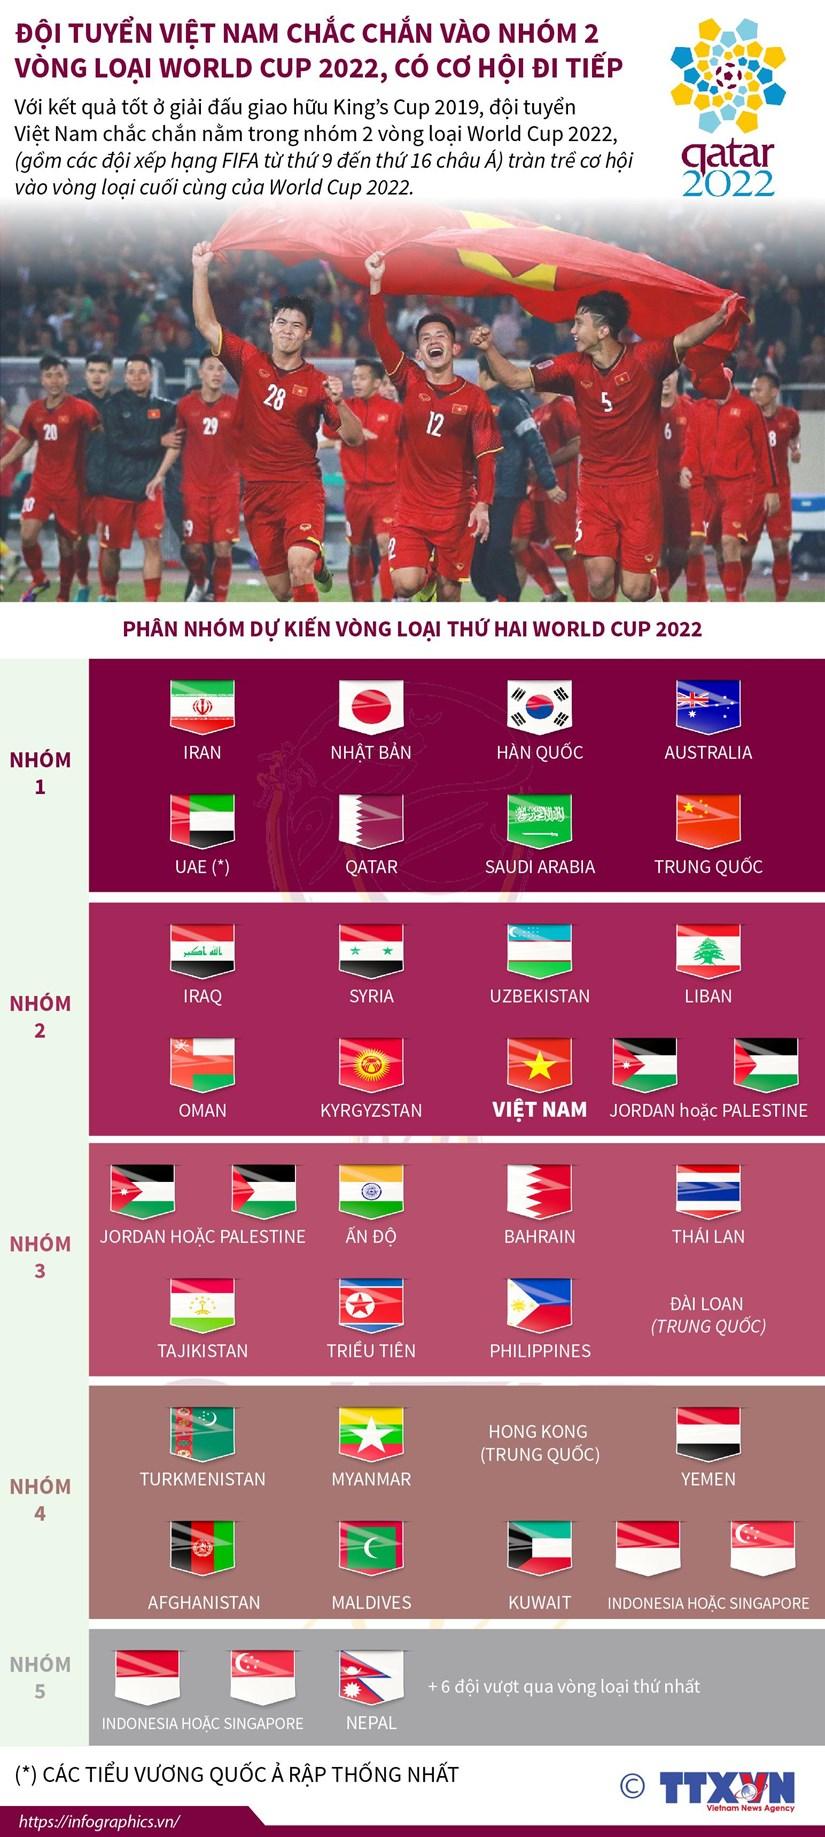 infographics doi tuyen viet nam vao nhom 2 vong loai world cup 2022